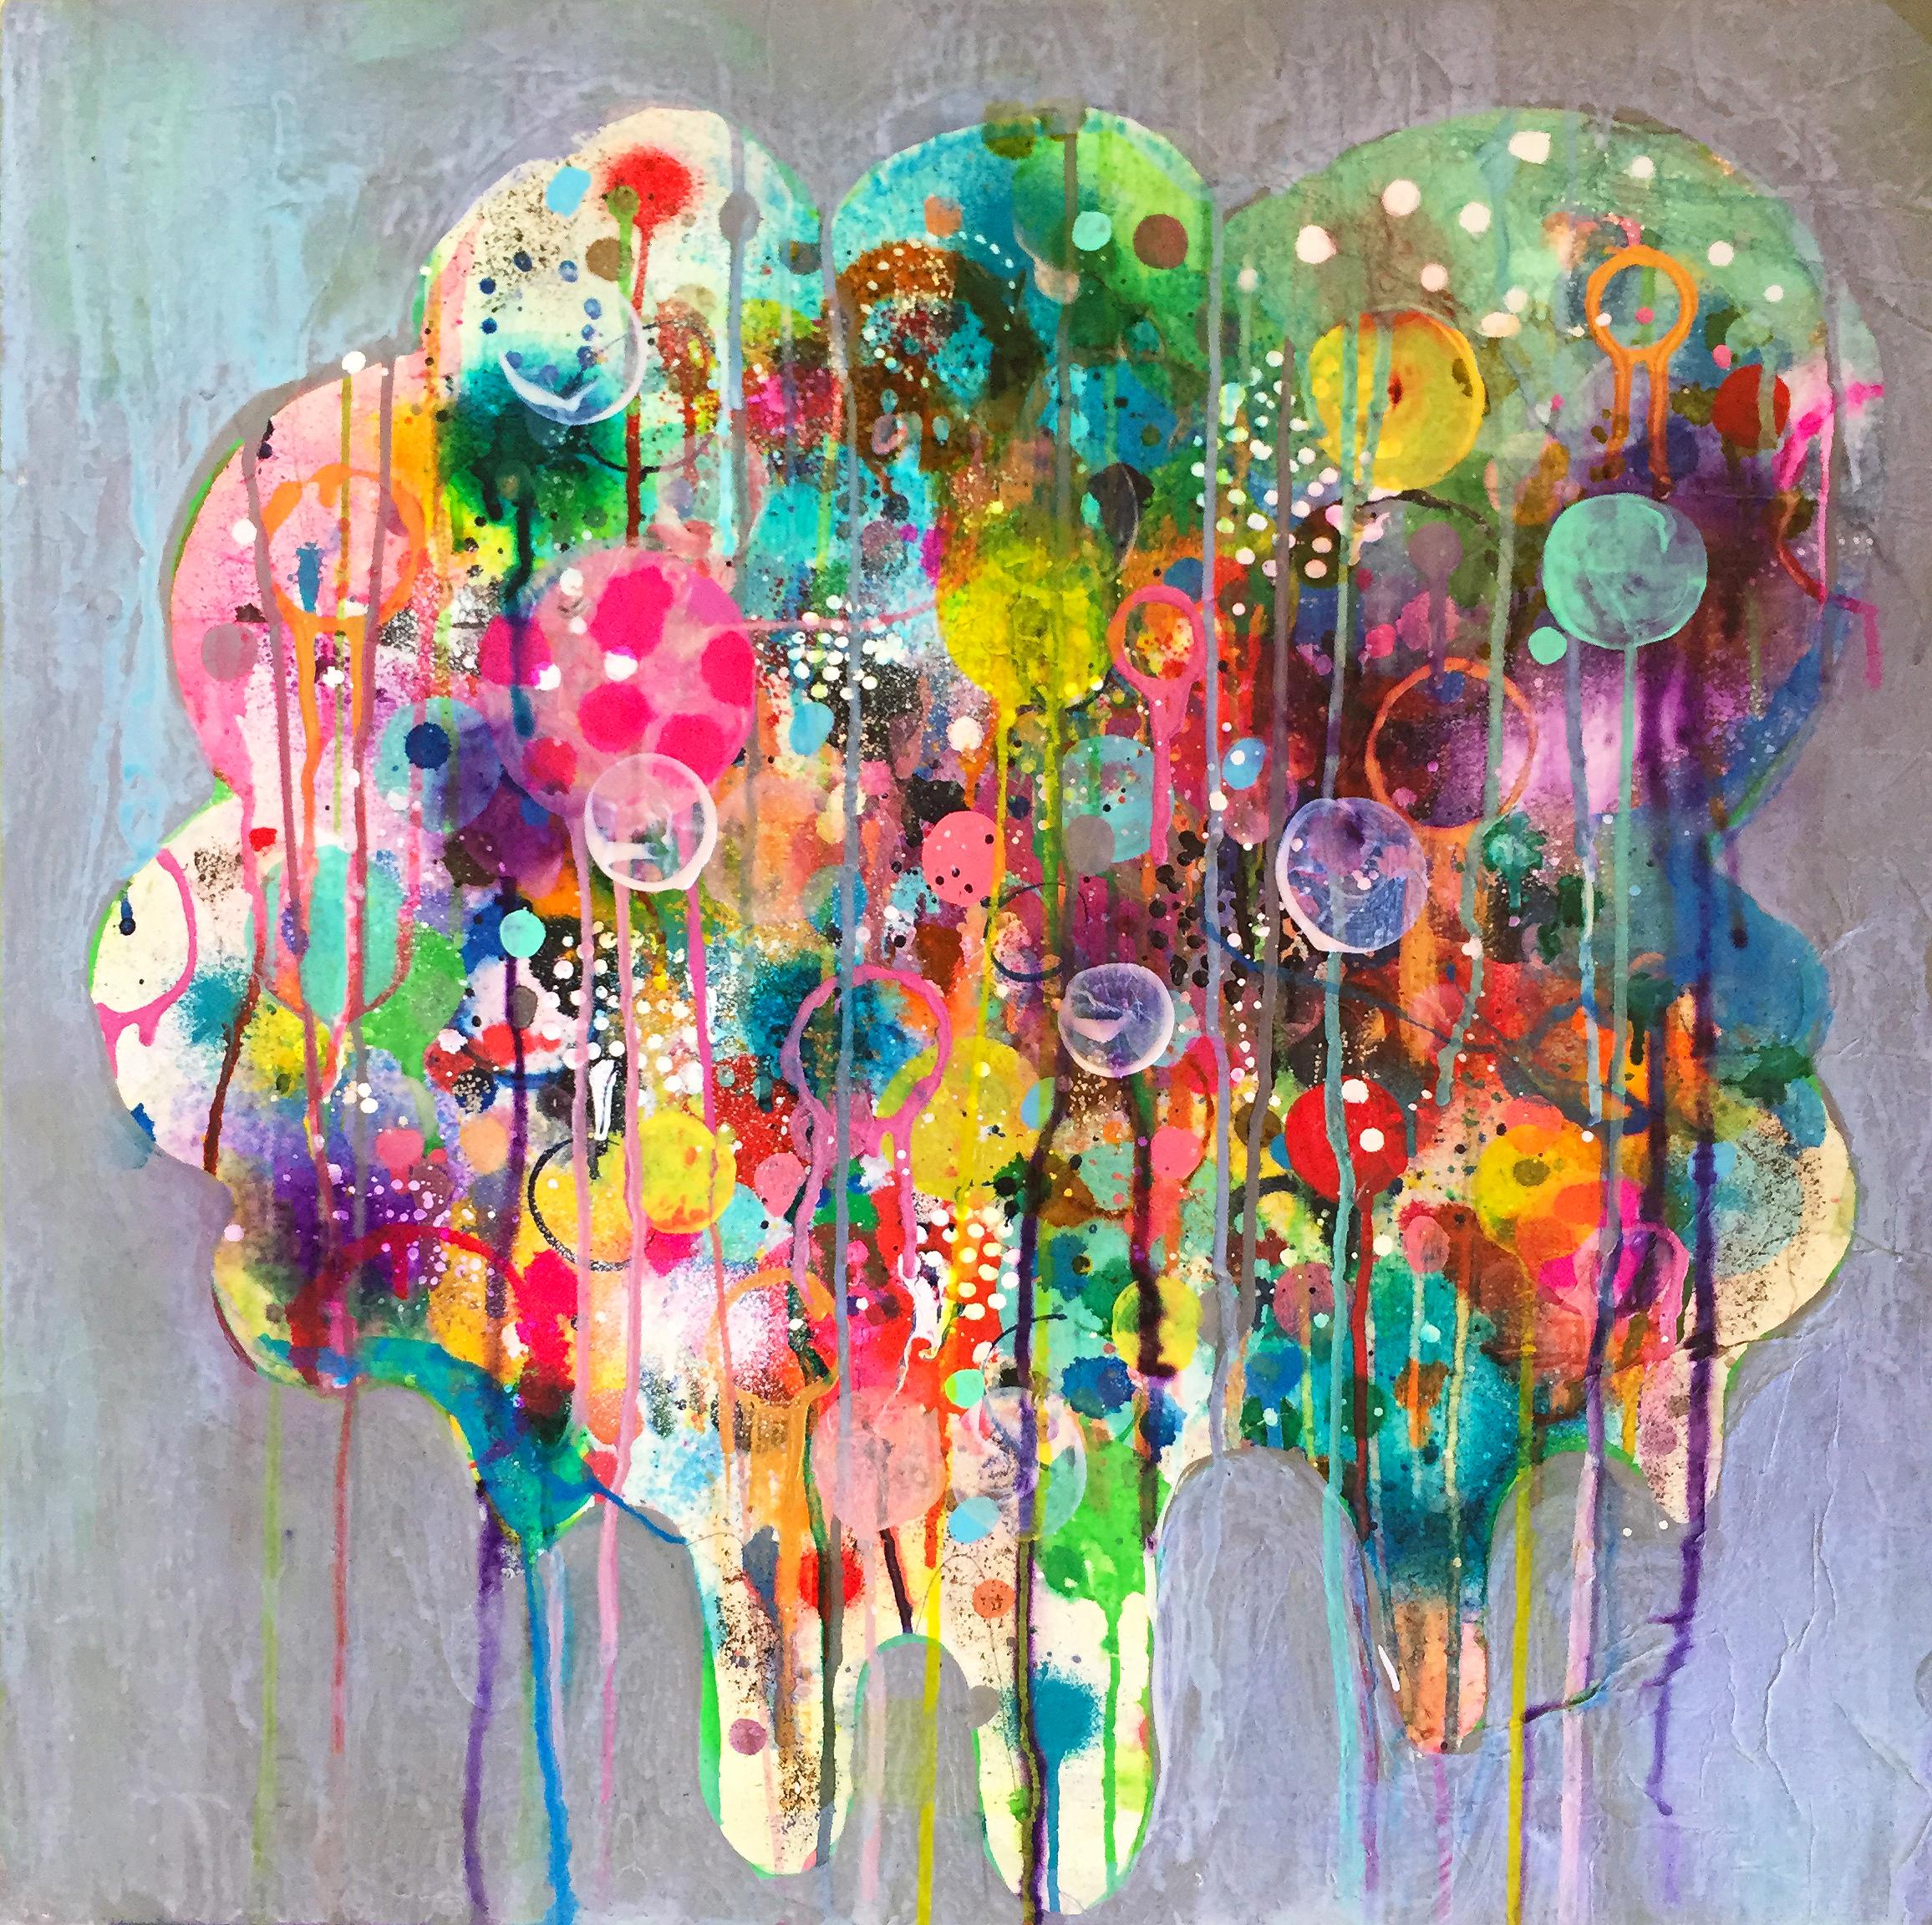 Painting by Liz Tran